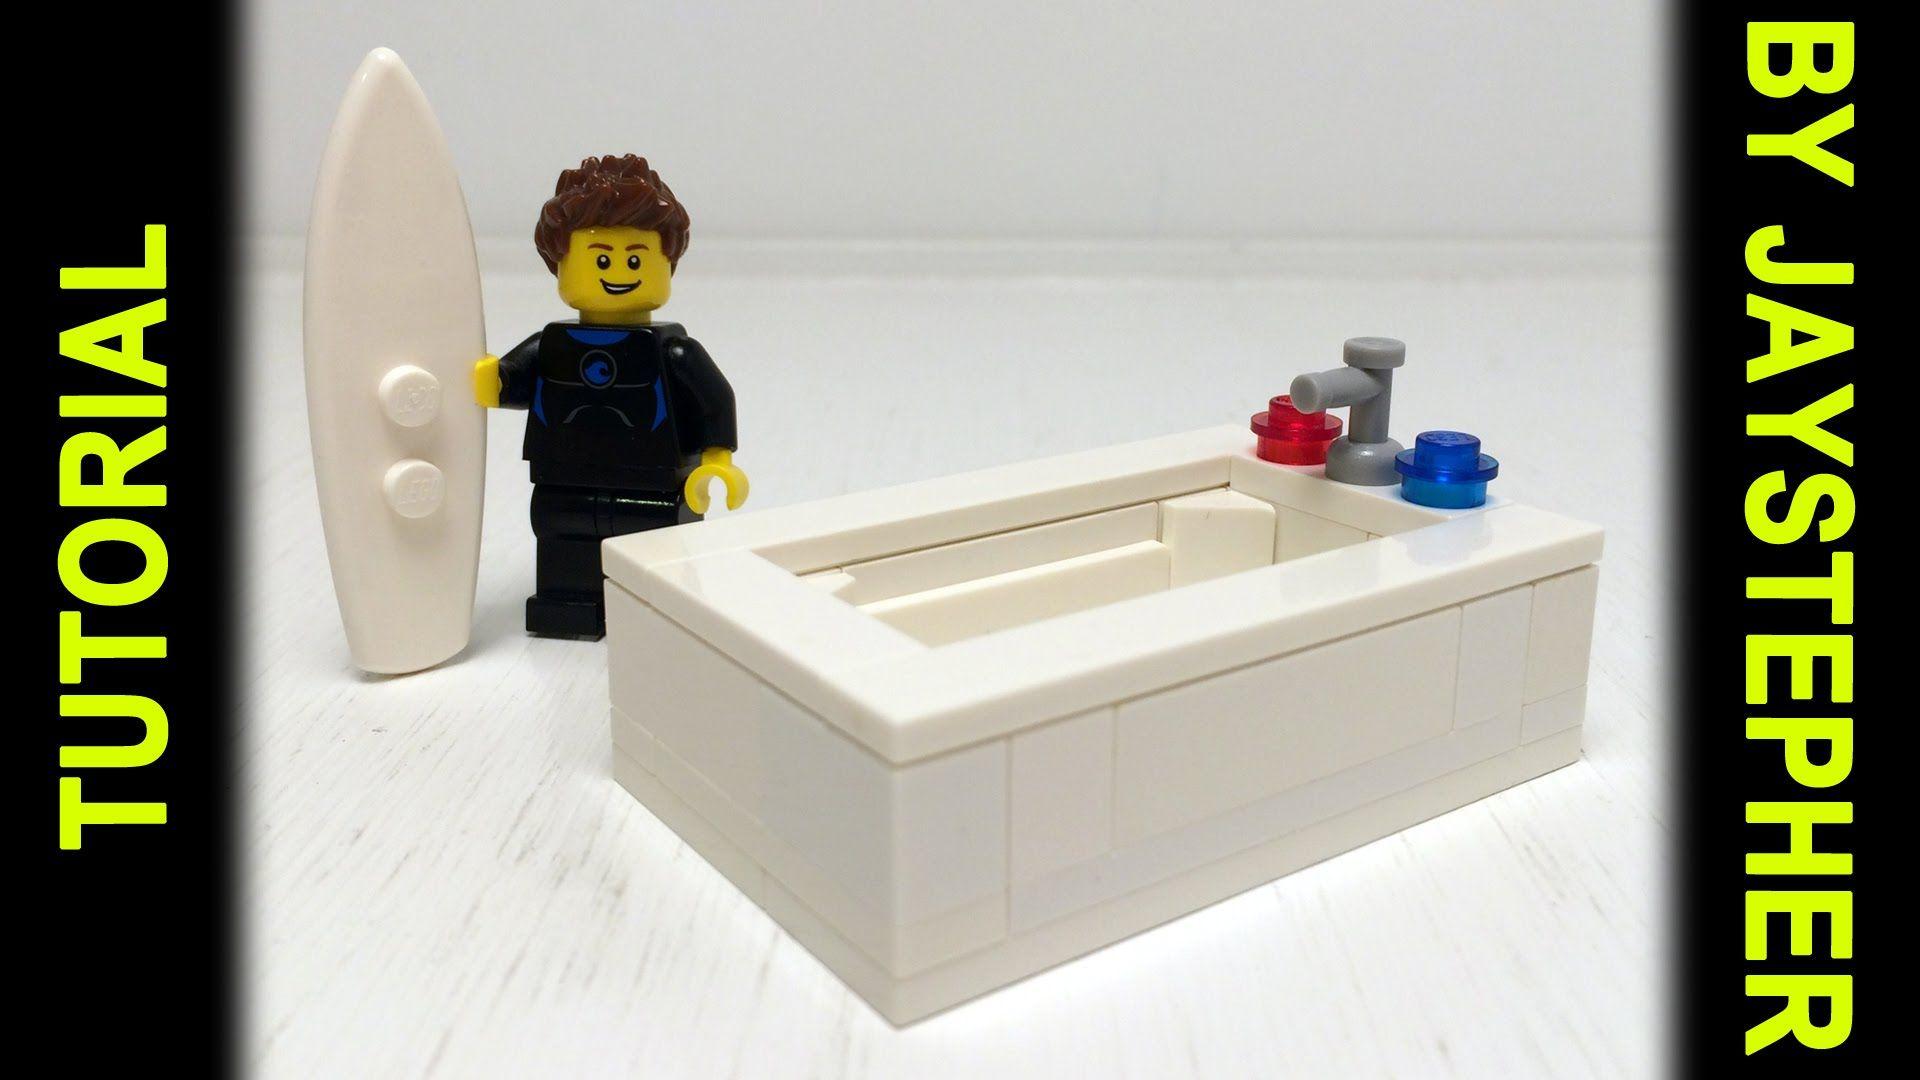 Tutorial - Large Lego Bathtub | Legos | Pinterest | Lego, Legos and ...